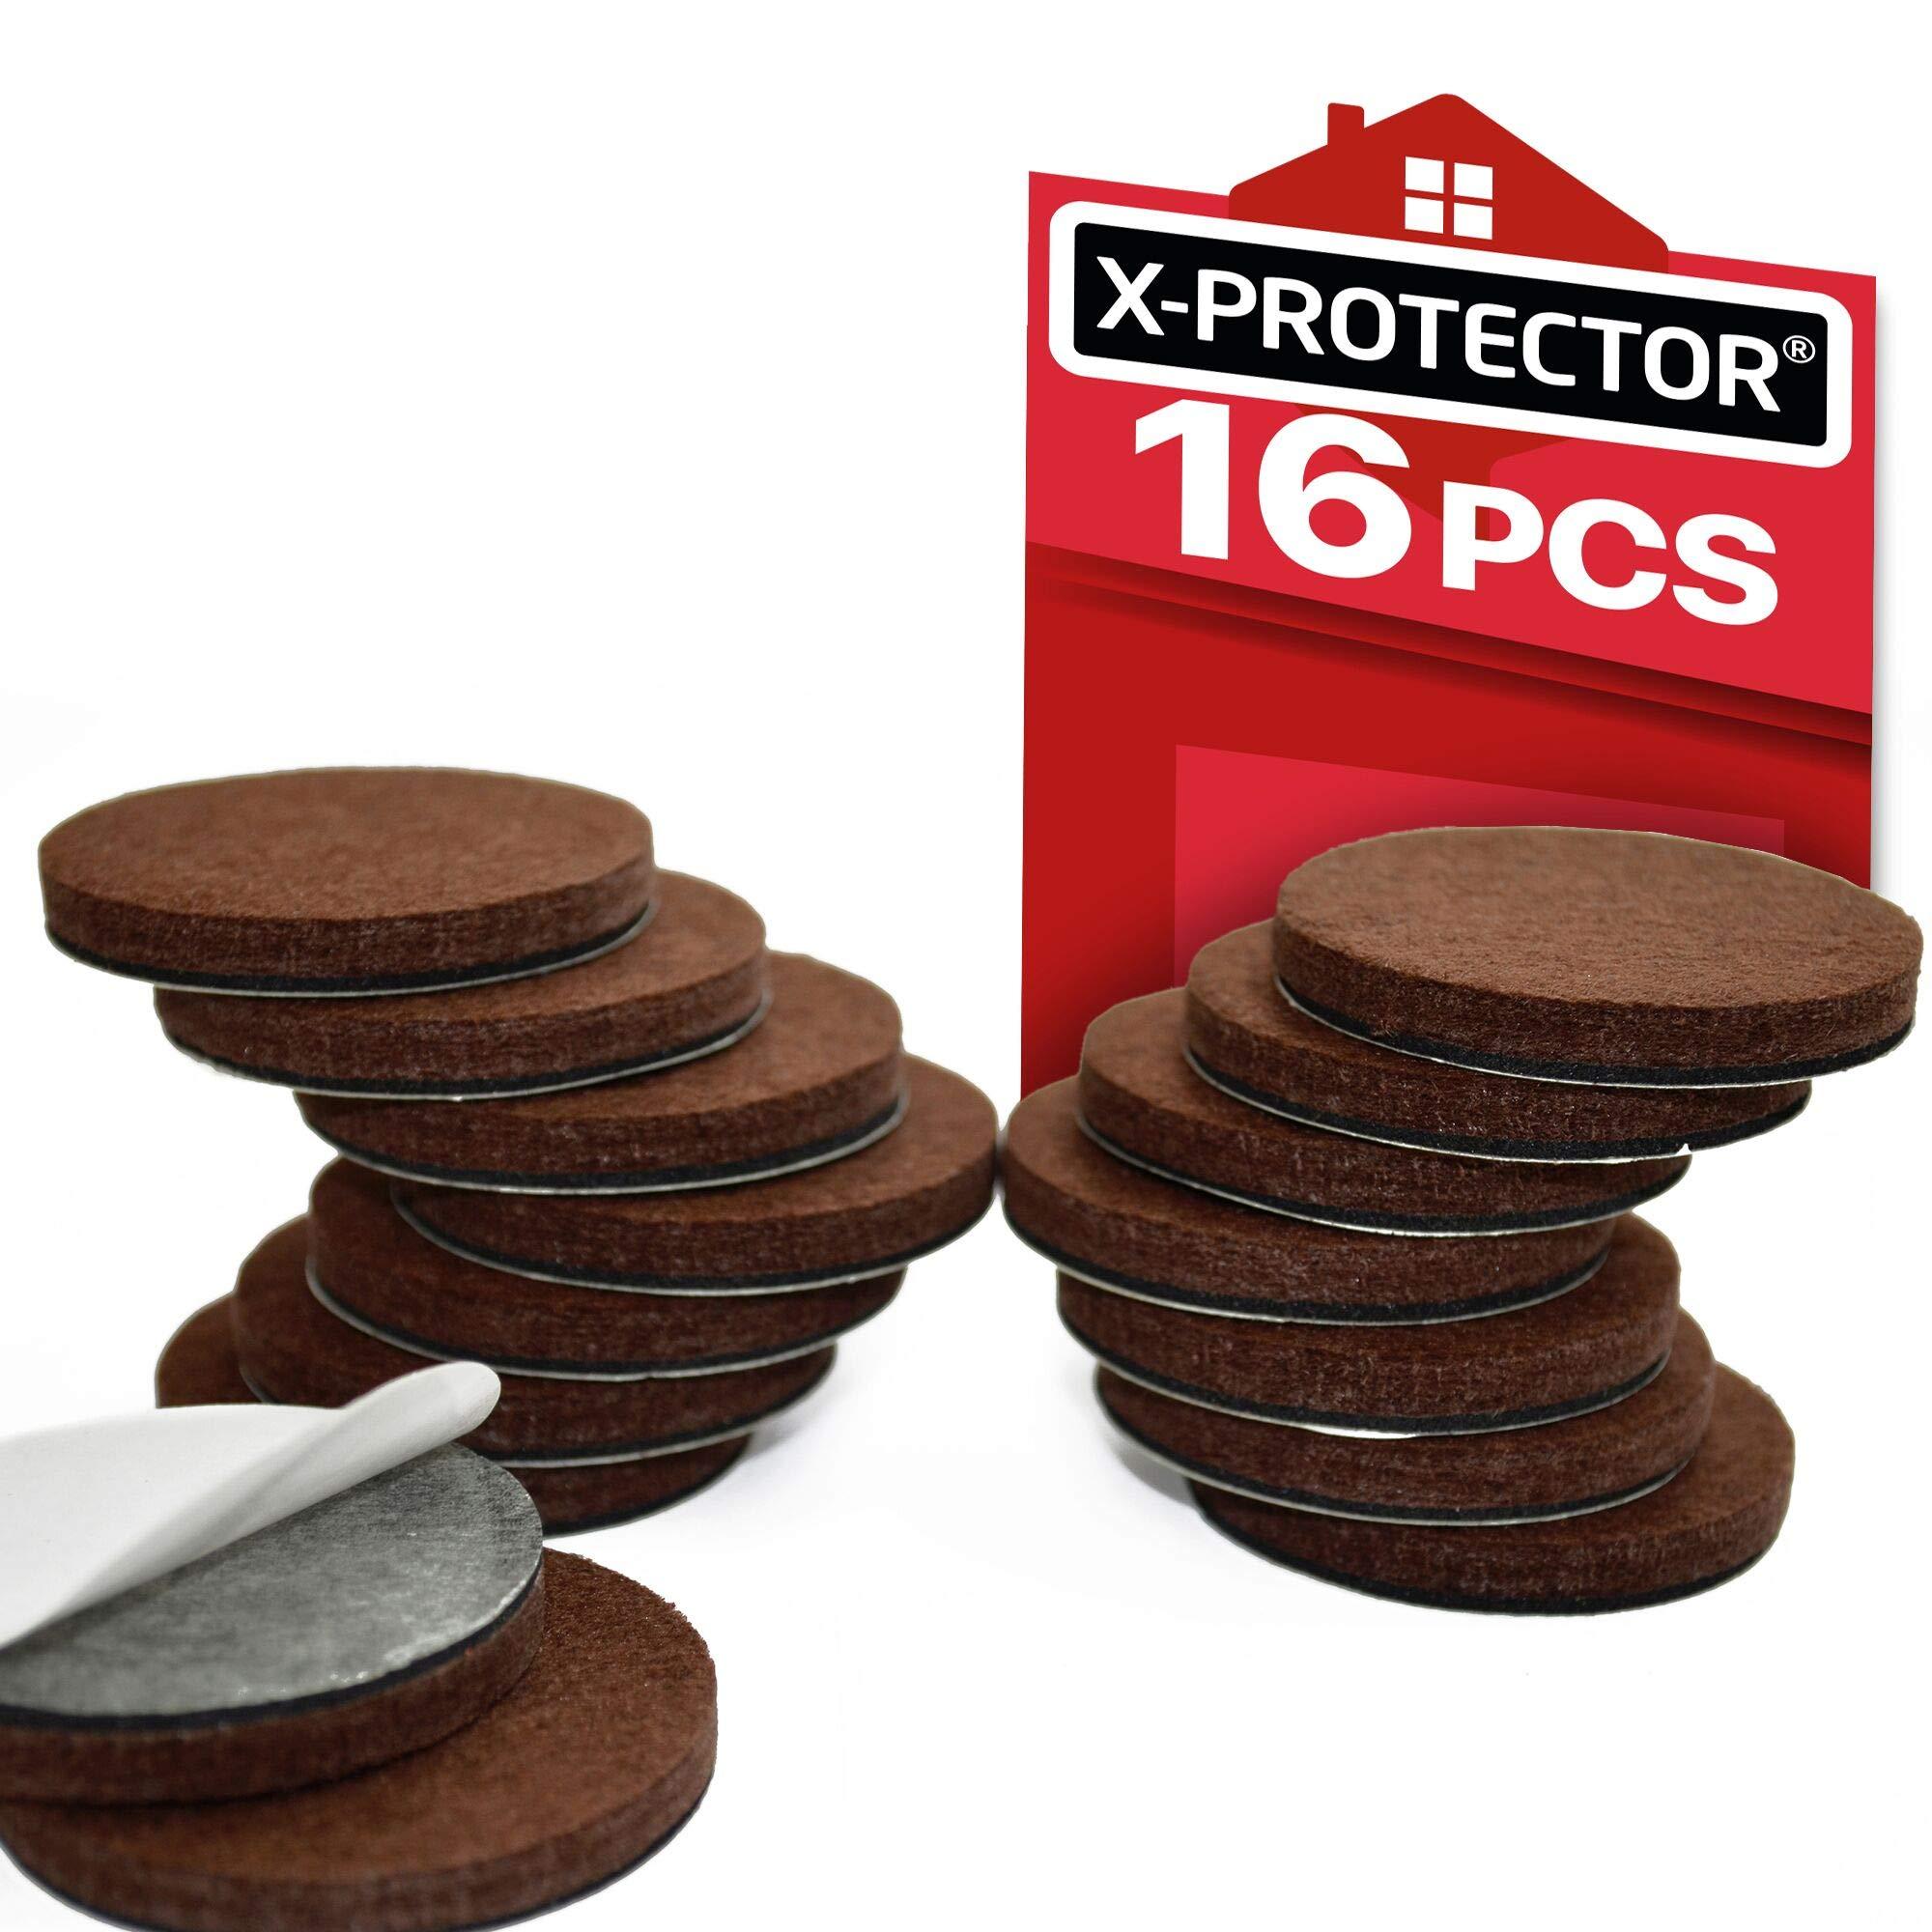 "X-PROTECTOR Premium 16 Thick 1/4"" Heavy Duty Felt Furniture Pads 2""! Felt Pads for Heavy Furniture Feet – Best Felts Wood Floor Protectors for NO Scratches Sliders. Protect Your Hardwood Floor!"